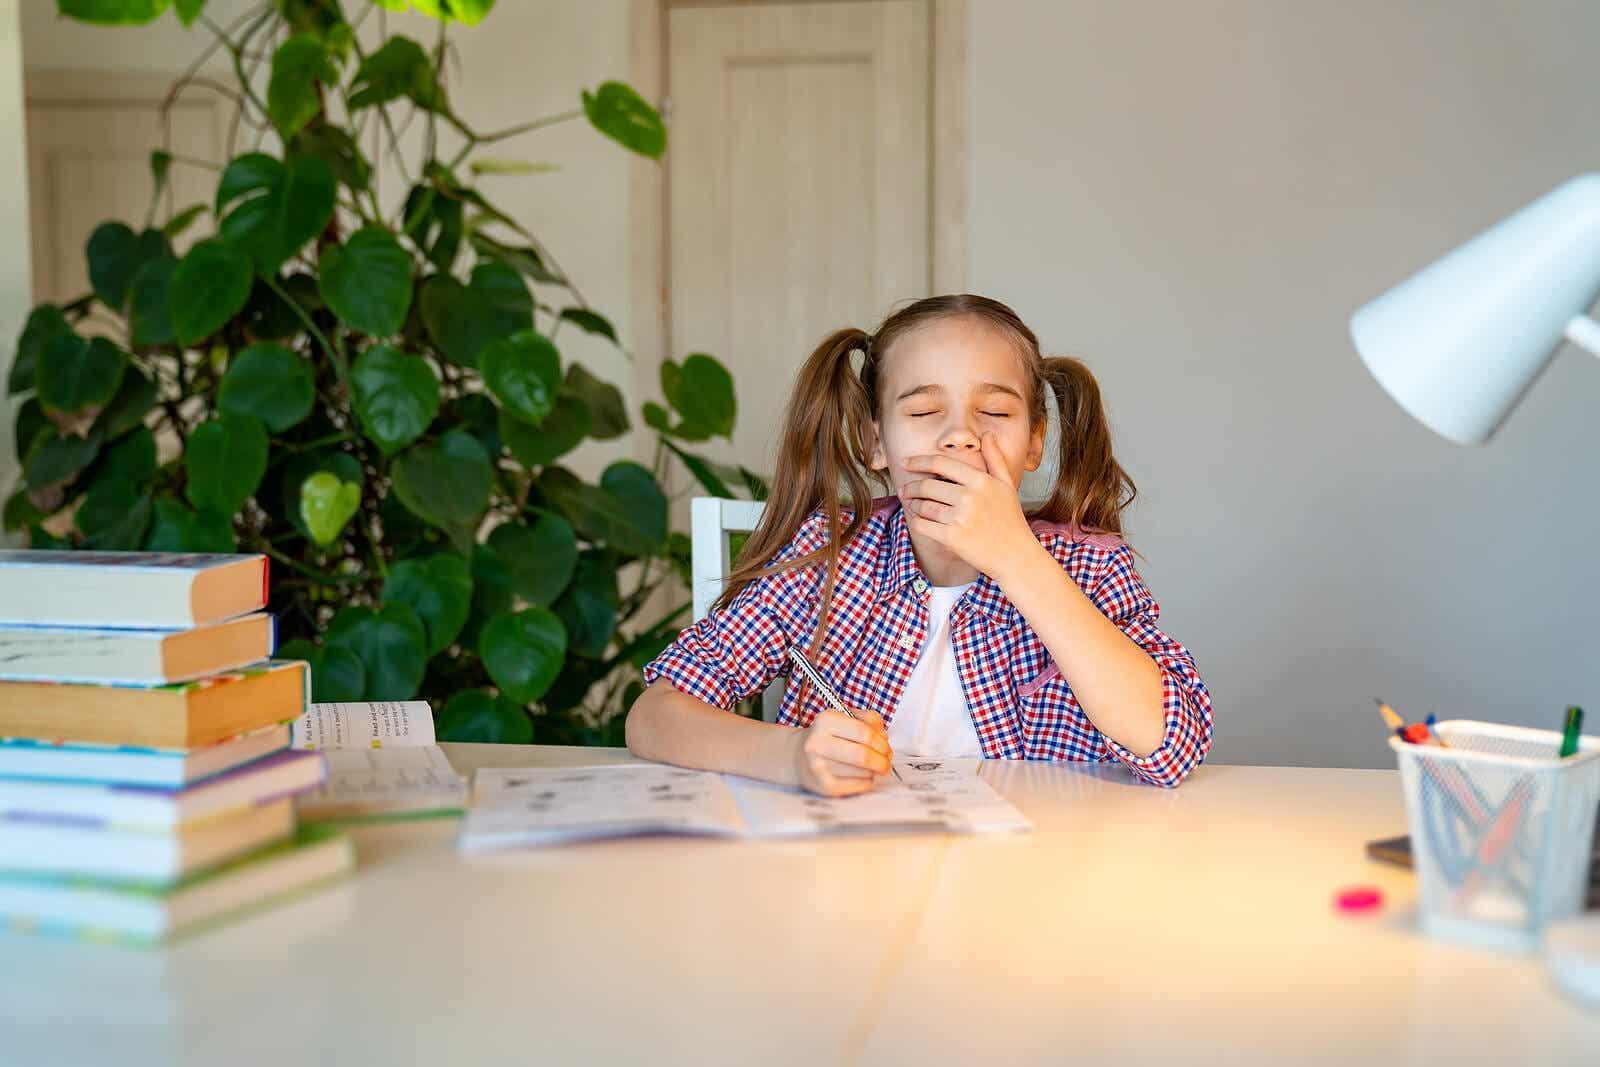 En teenagepige gaber, mens hun laver lektier